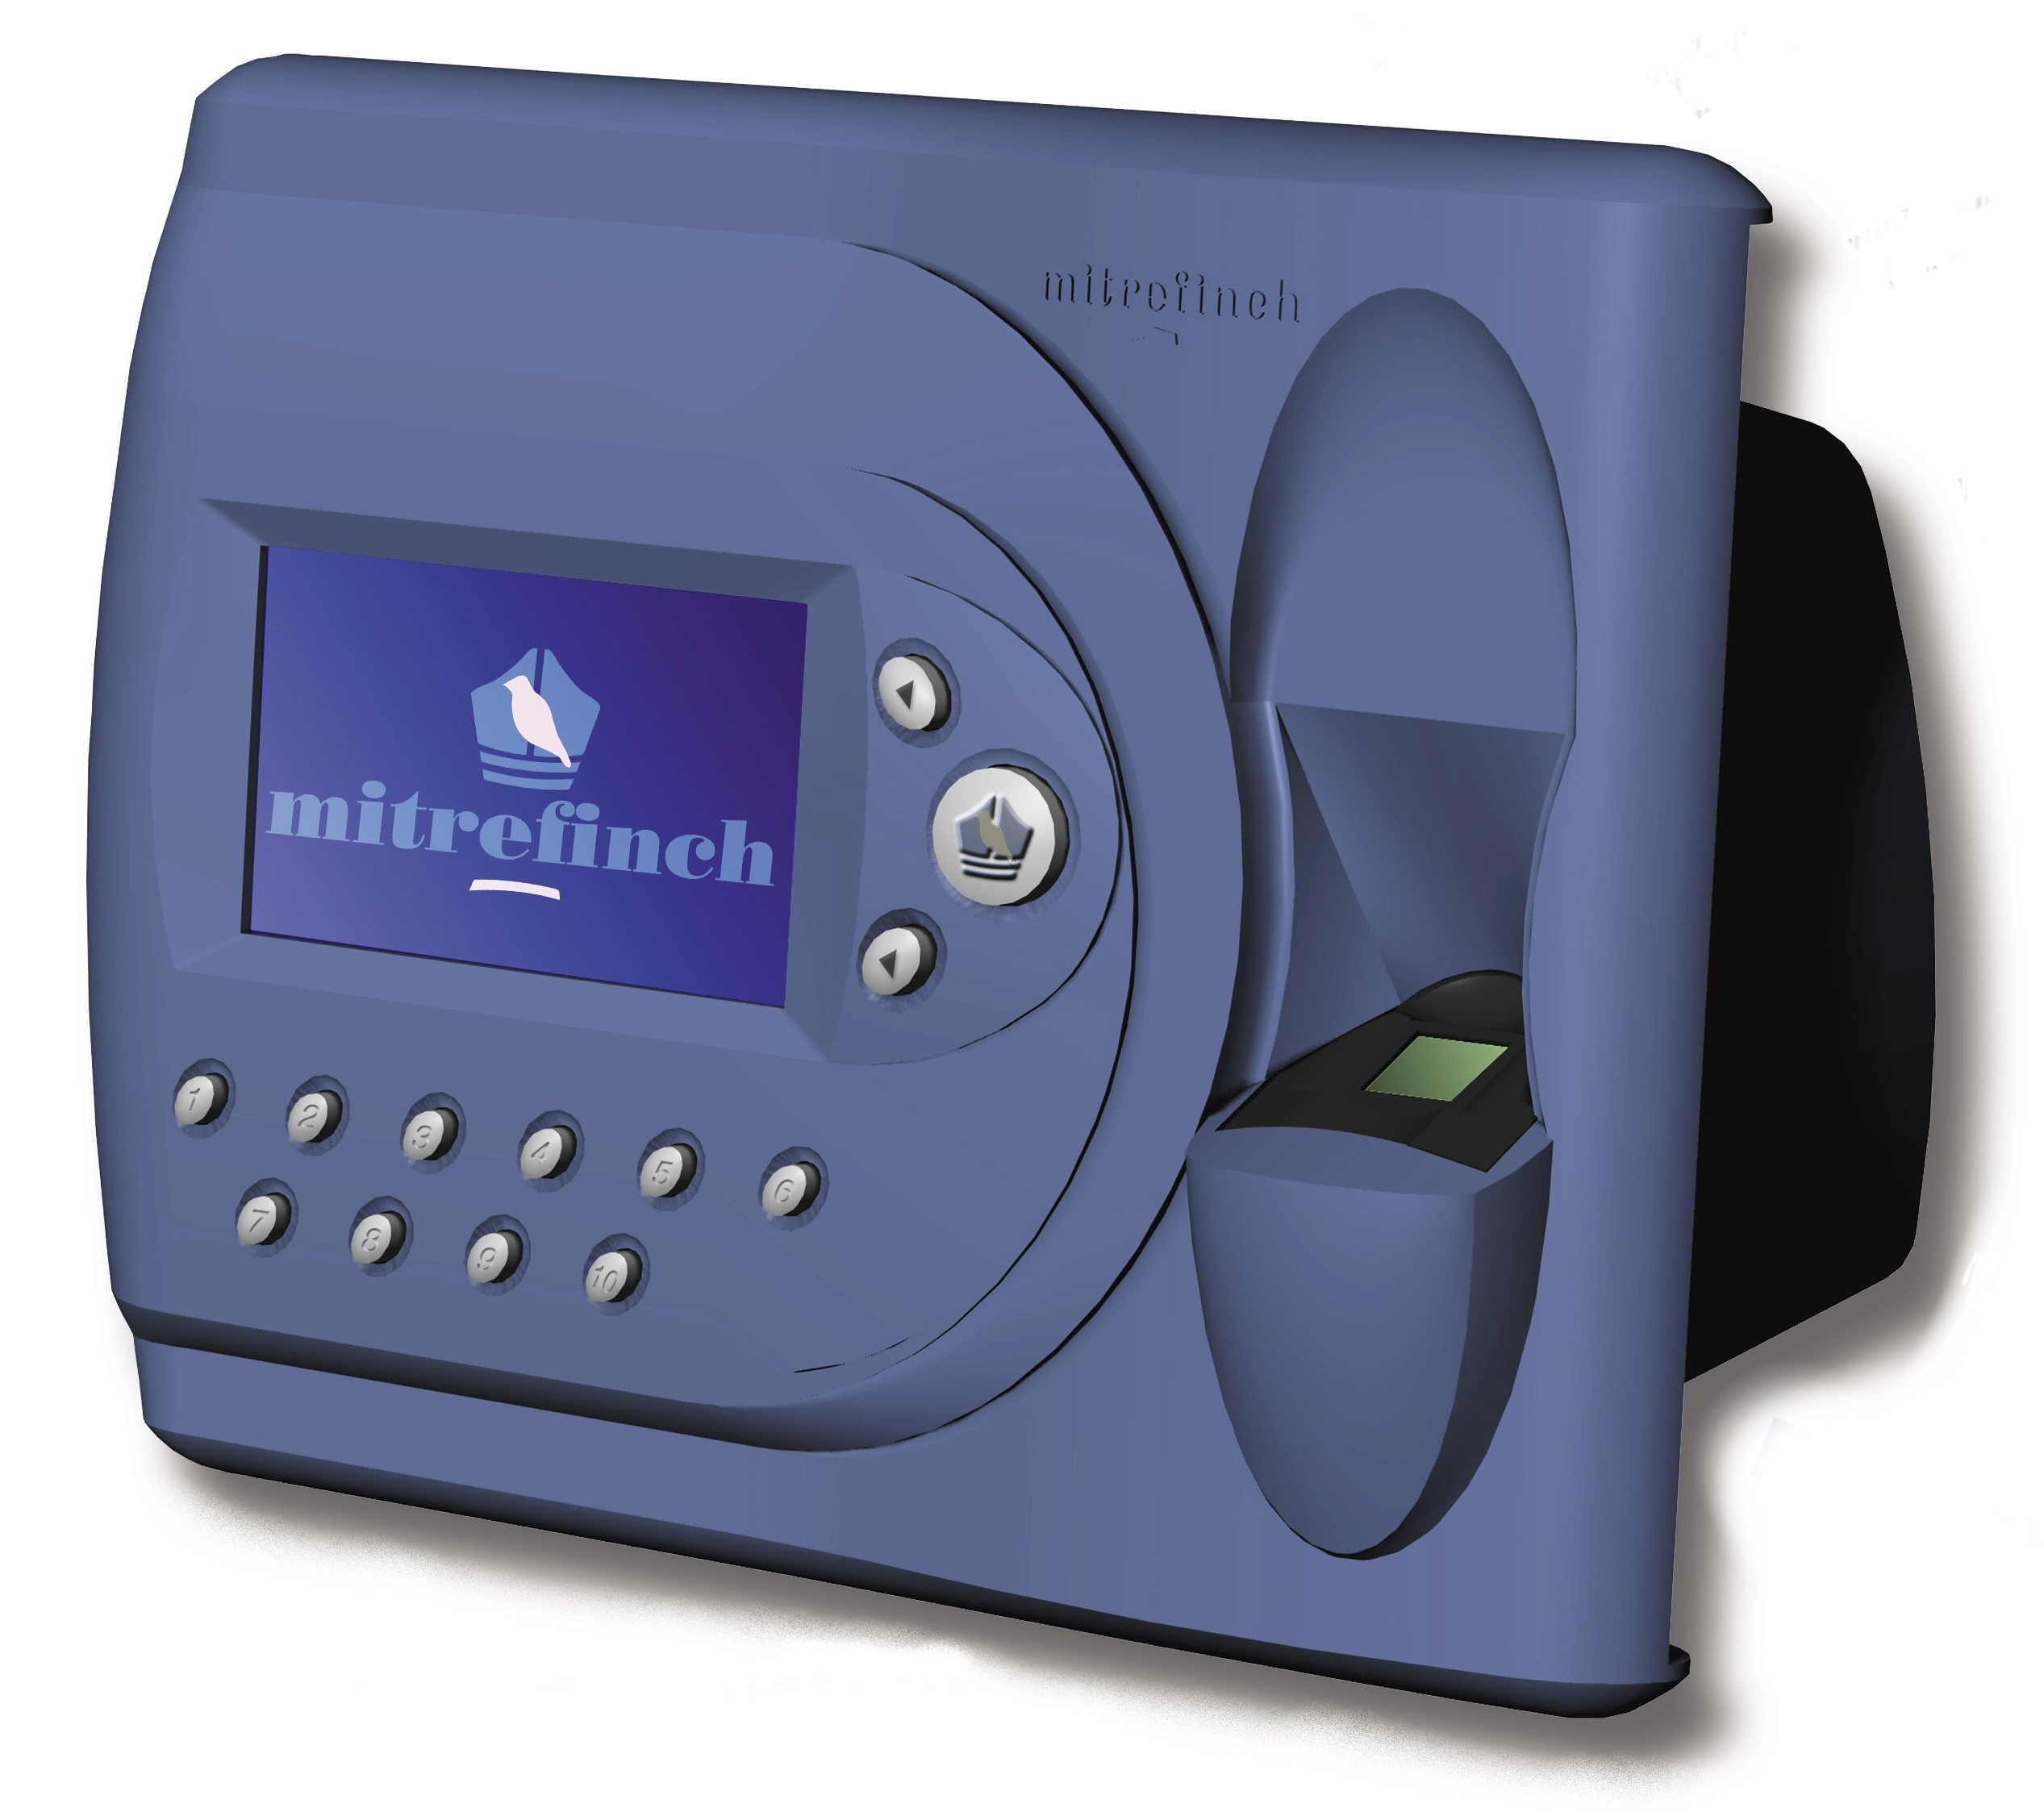 clocking in machine fingerprint